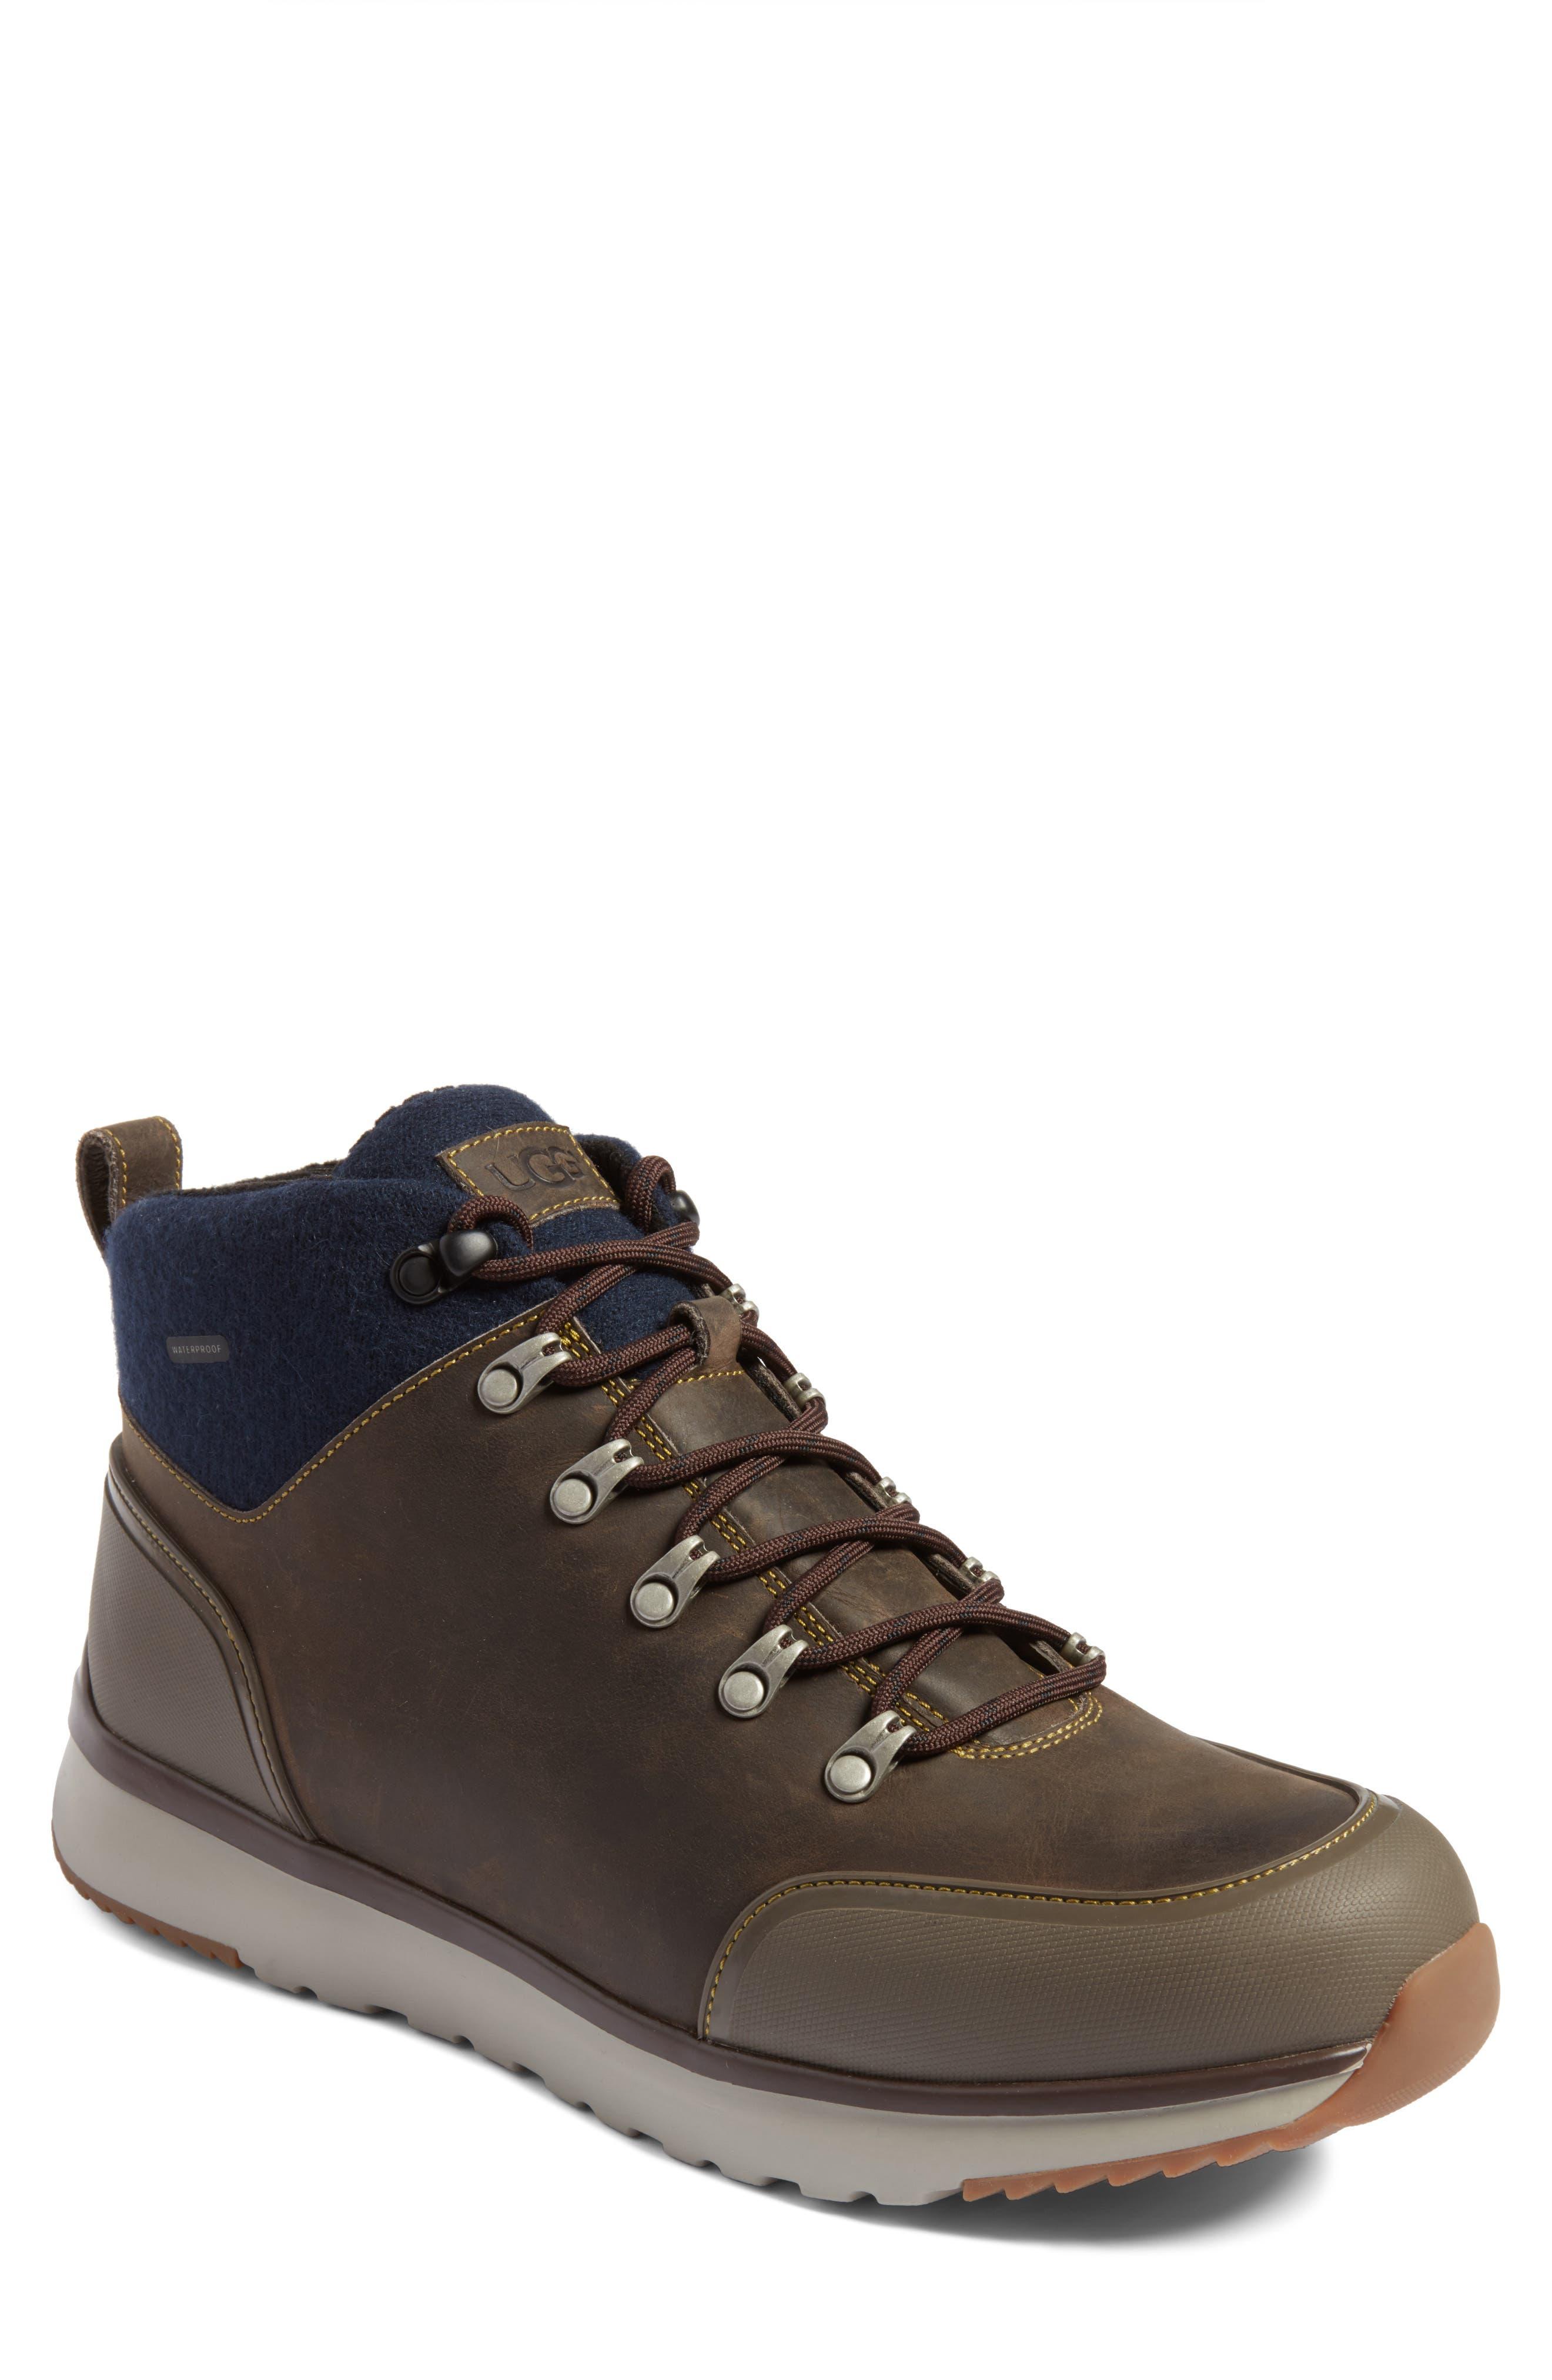 Ugg Olivert Hiking Waterproof Boot, Grey